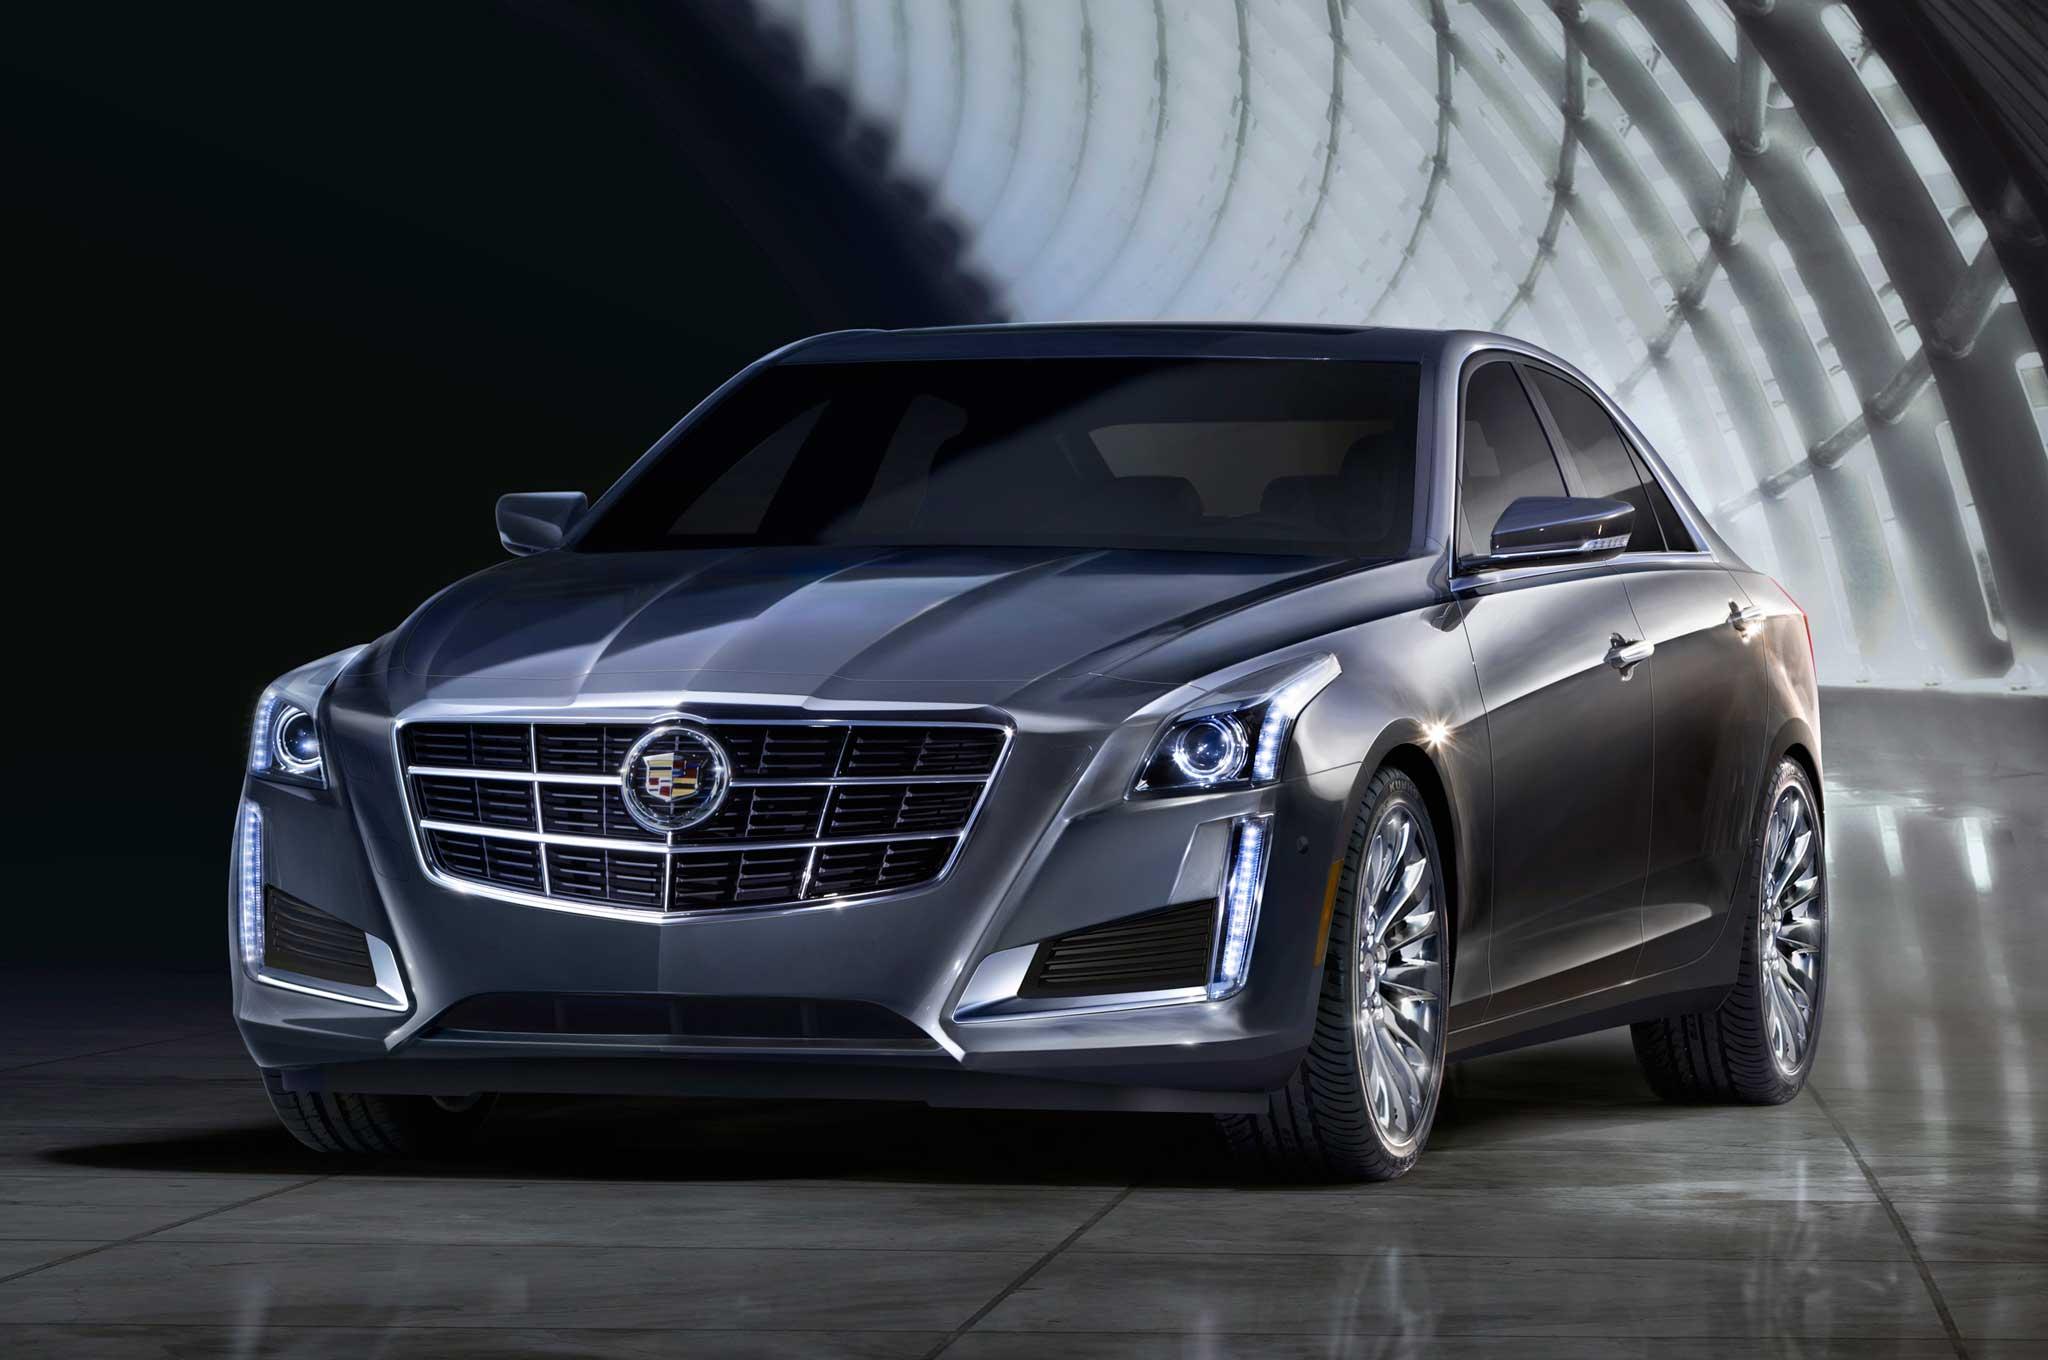 2014 Cadillac CTS Front Three Quarter1